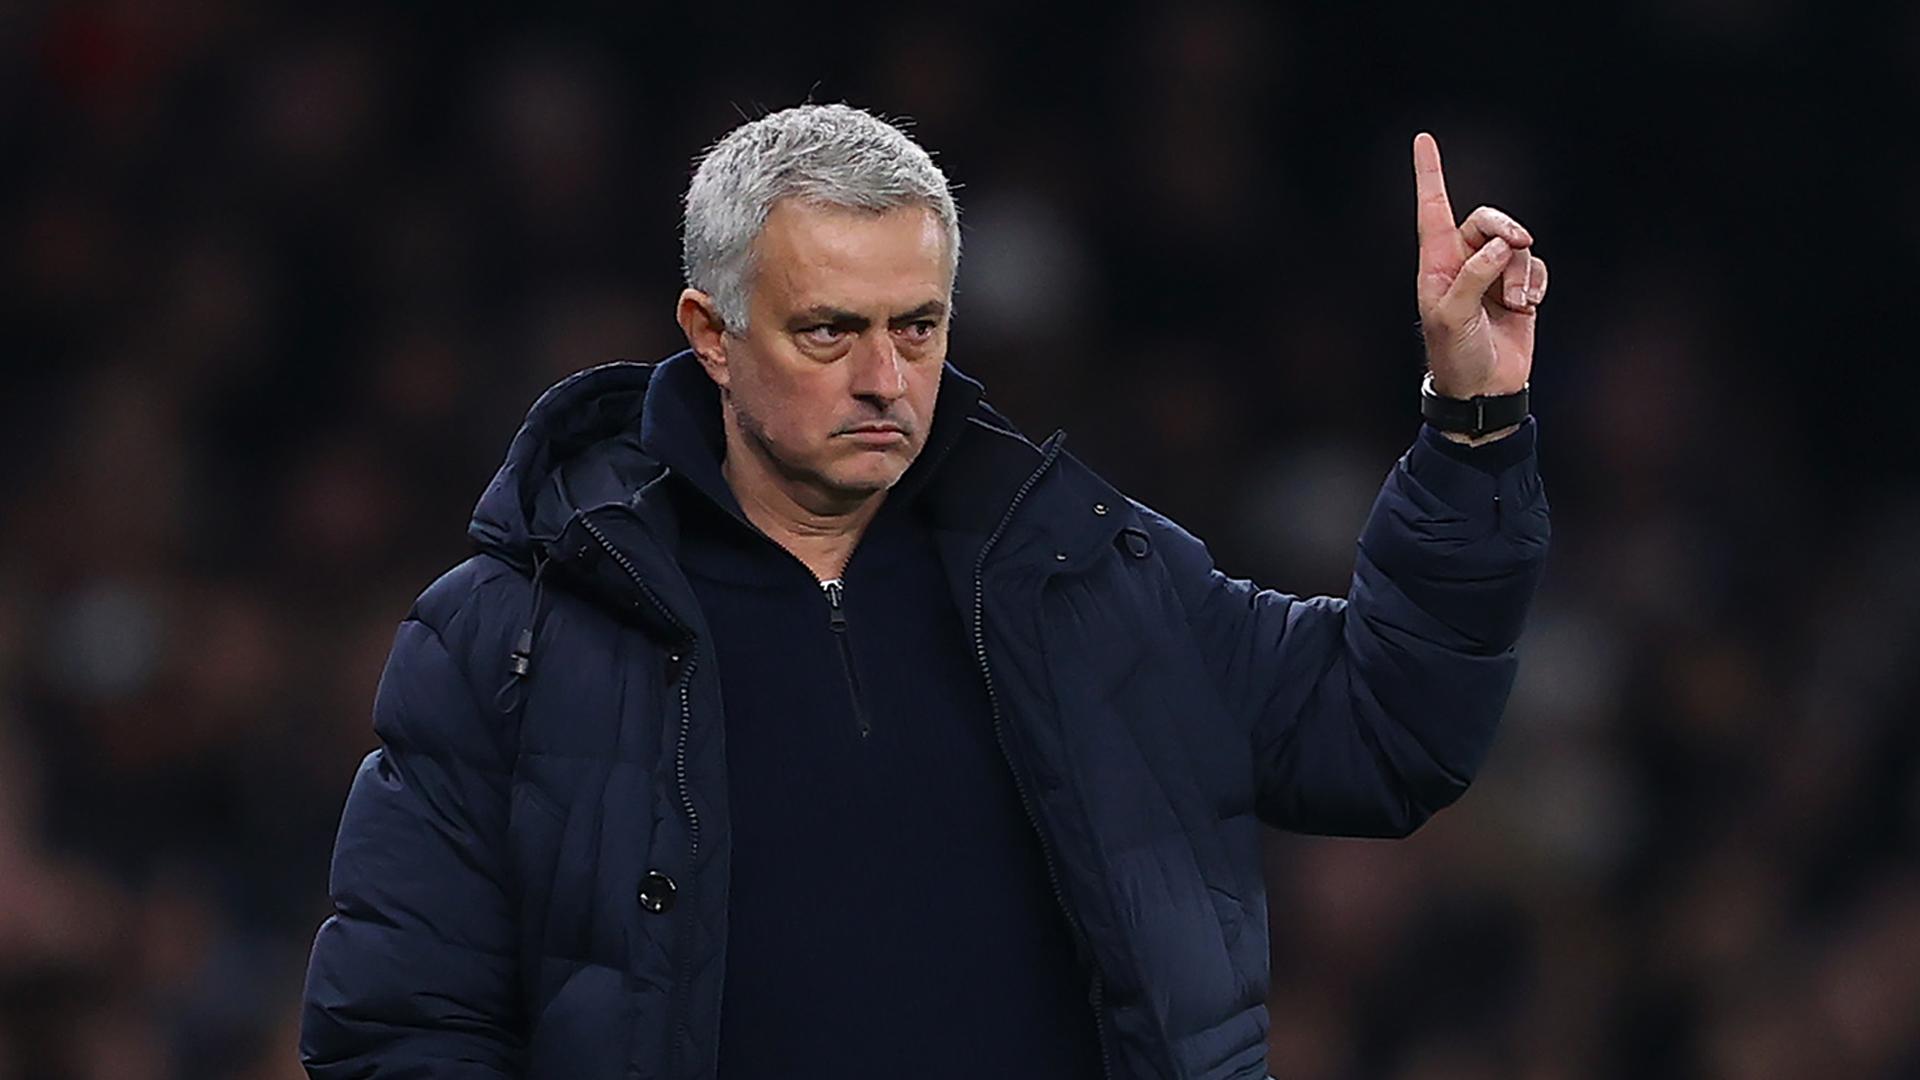 Tottenham Hotspur manager, Jose Mourinho, gives injury updates as Tottenham prepare to play Man Utd